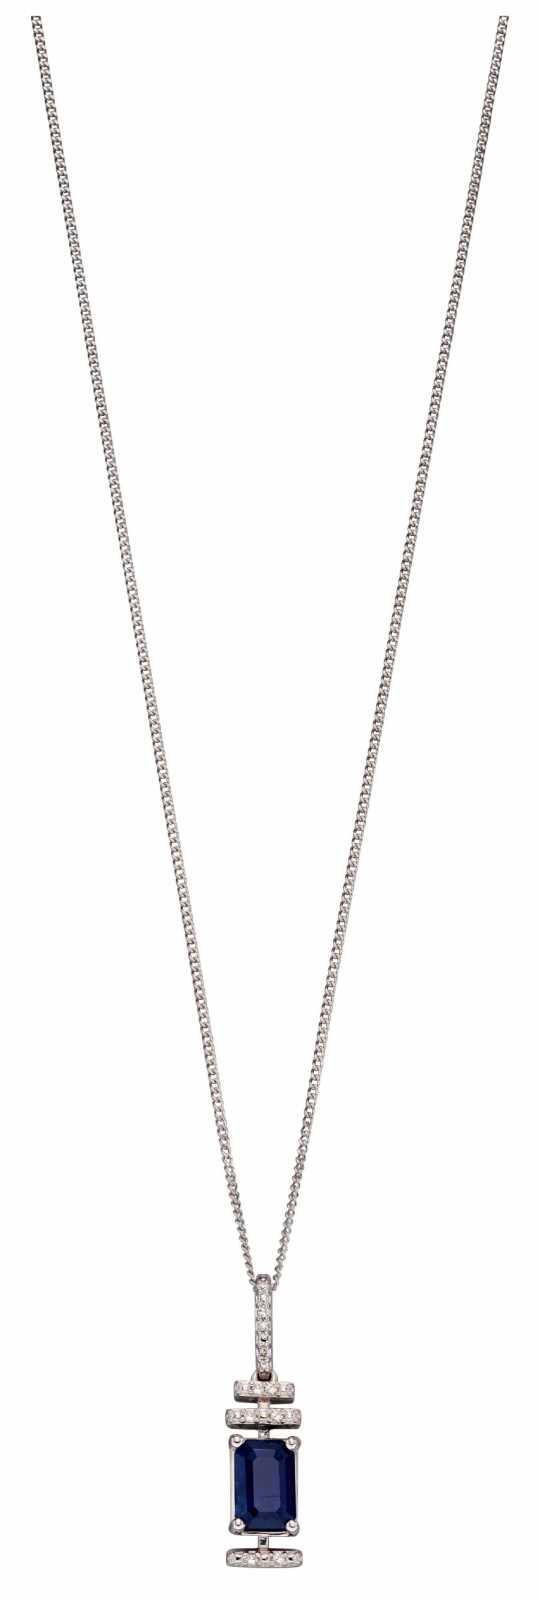 Elements Gold 9k White Gold Sapphire Diamond Deco Pendant Only GP2184L